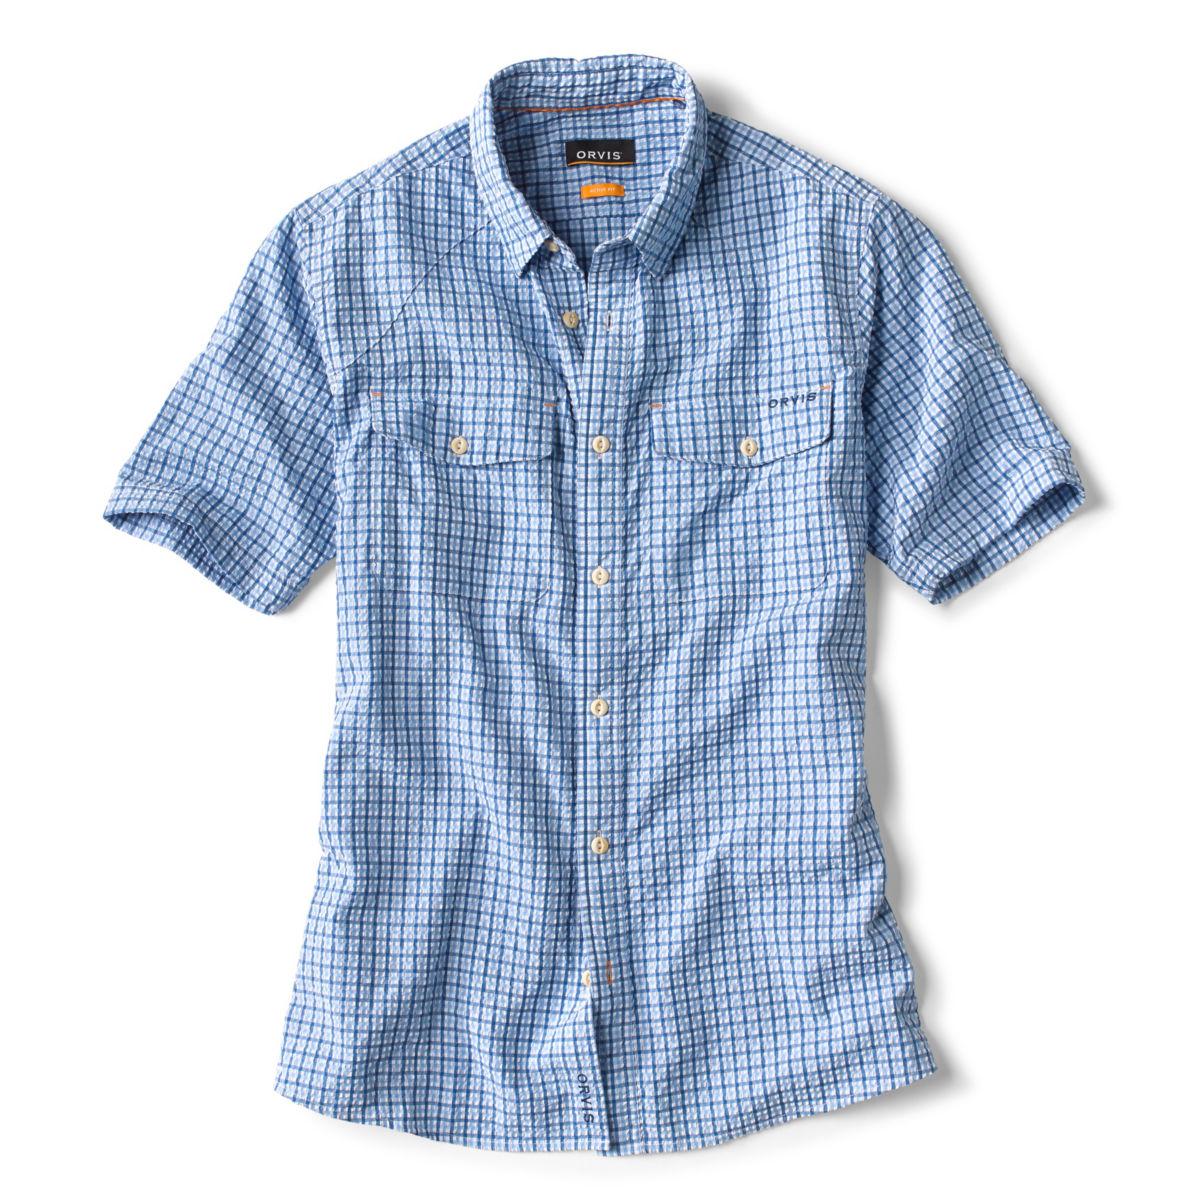 Clearwater Seersucker Short-Sleeved Shirt - MEDIUM BLUE TATTERSALLimage number 0